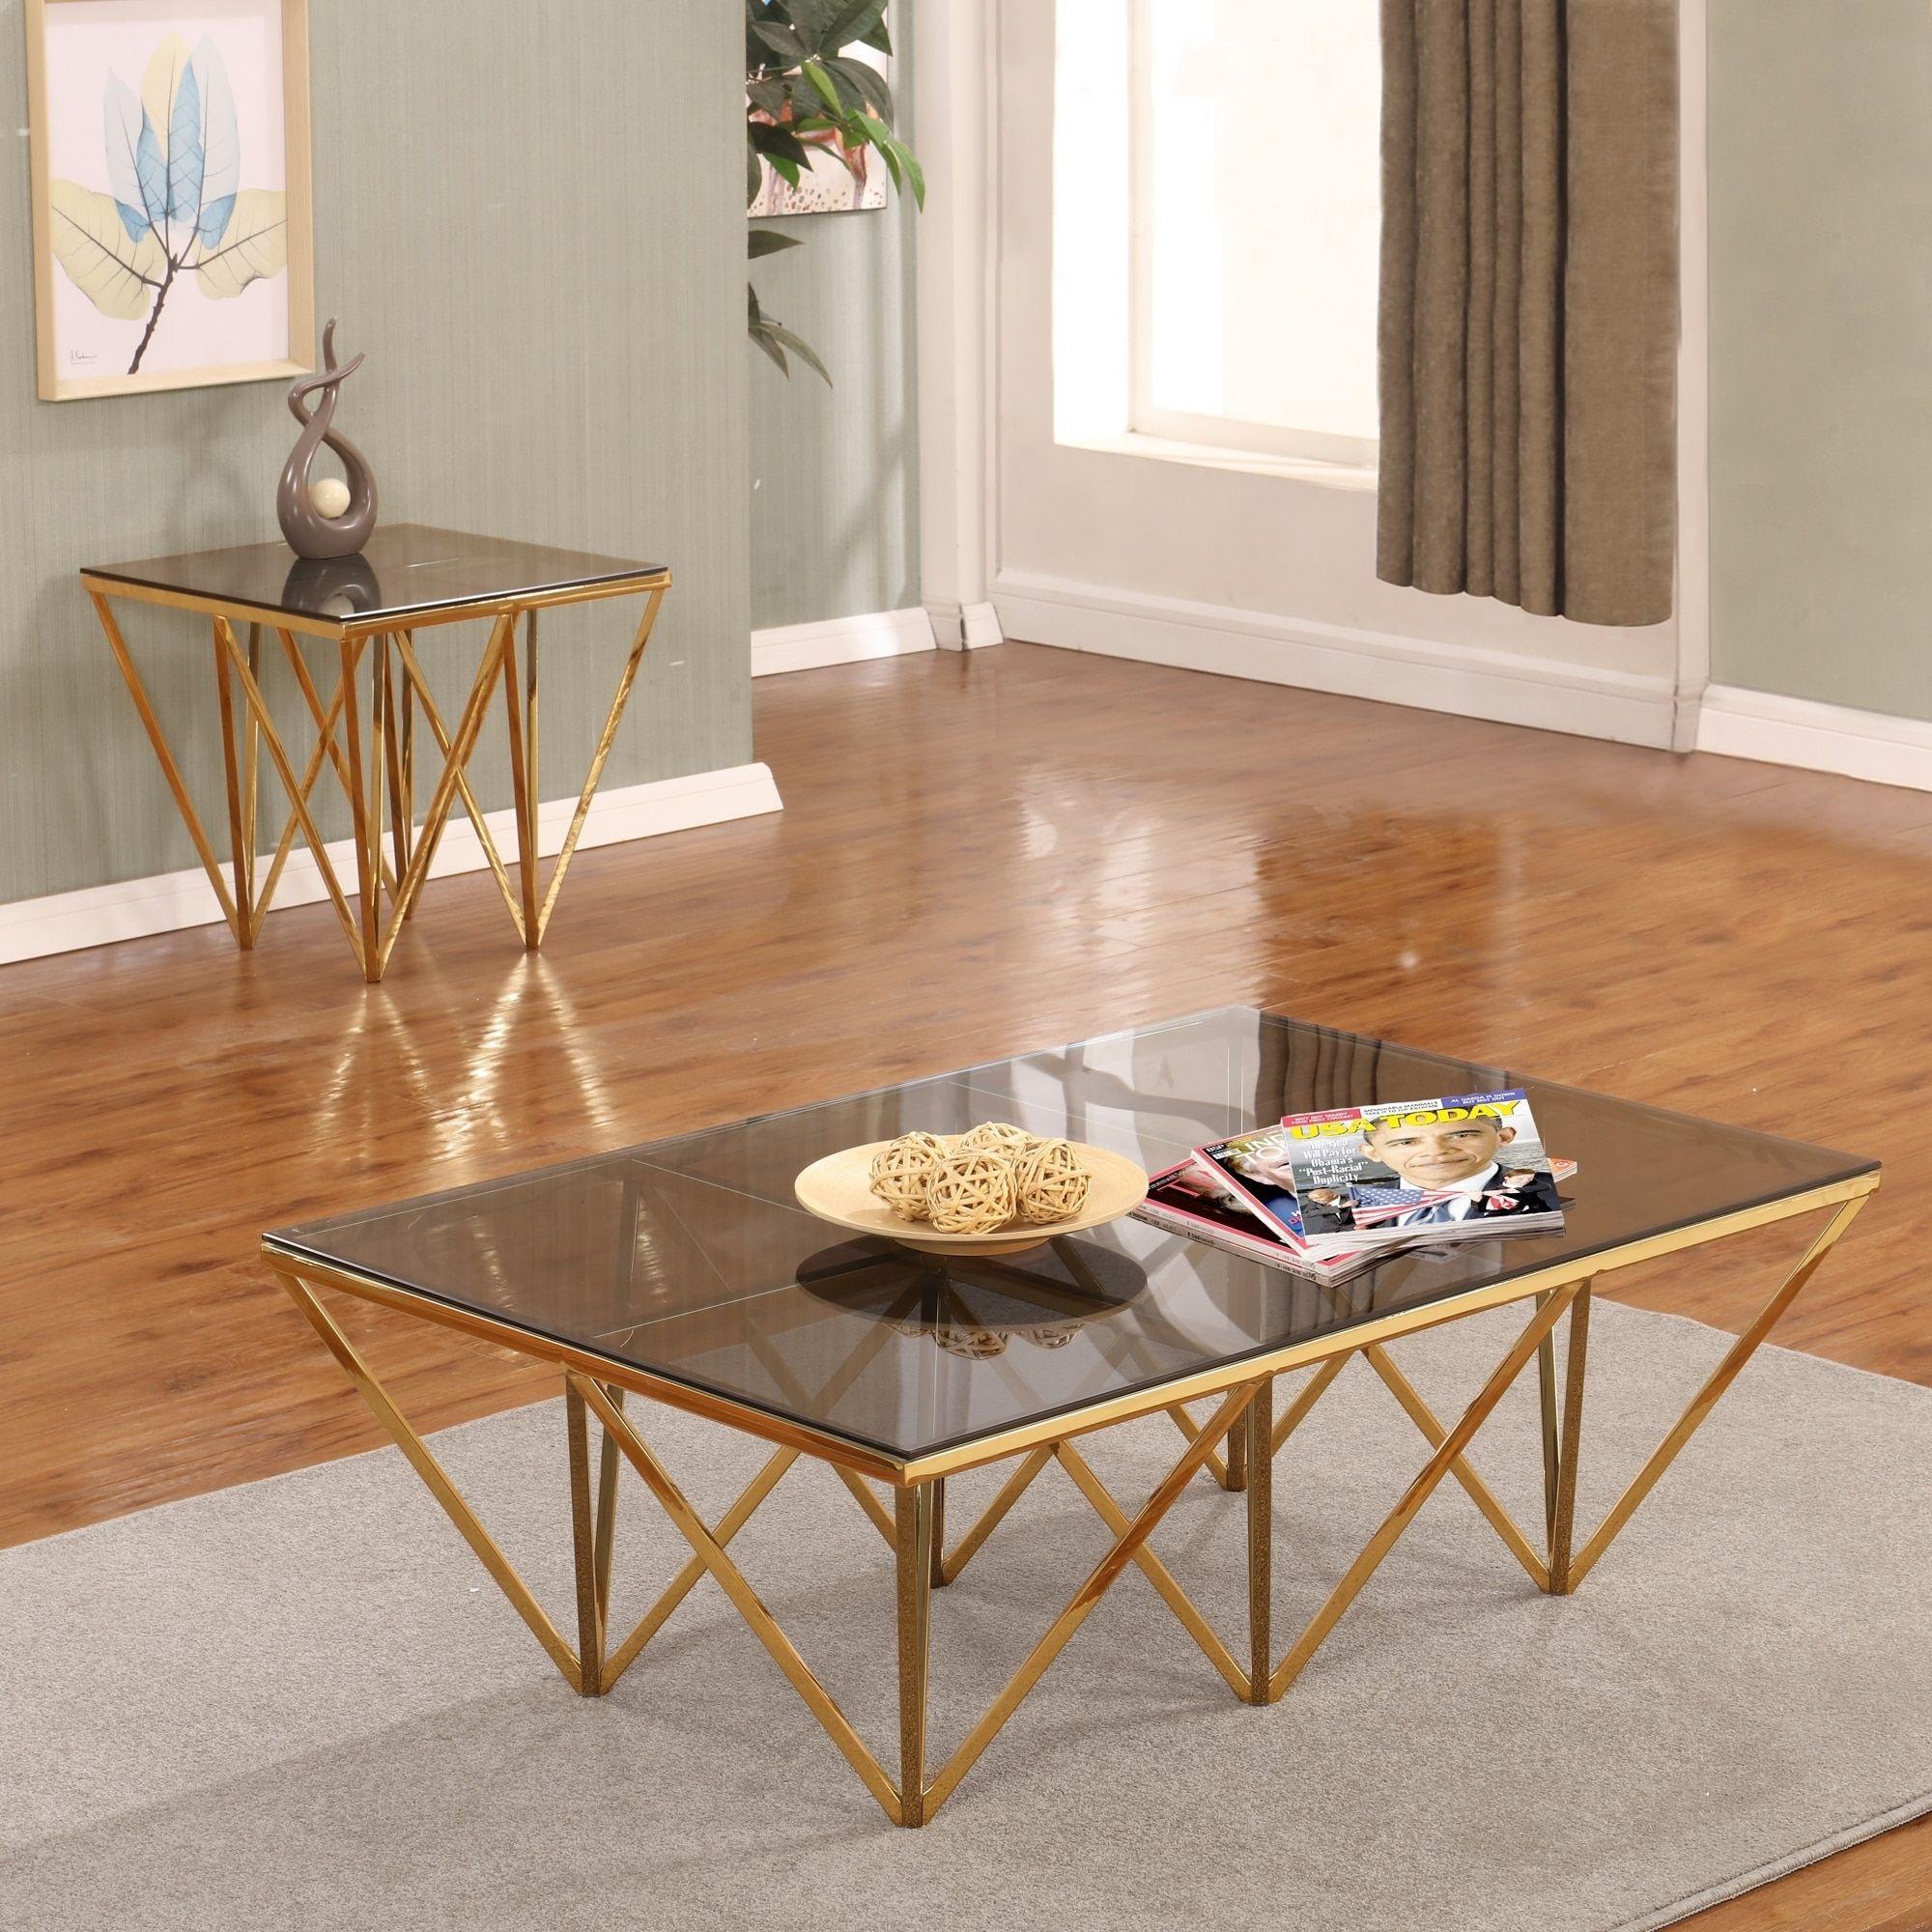 The Versatile Glass Coffee Table For Room Decor S Izobrazheniyami